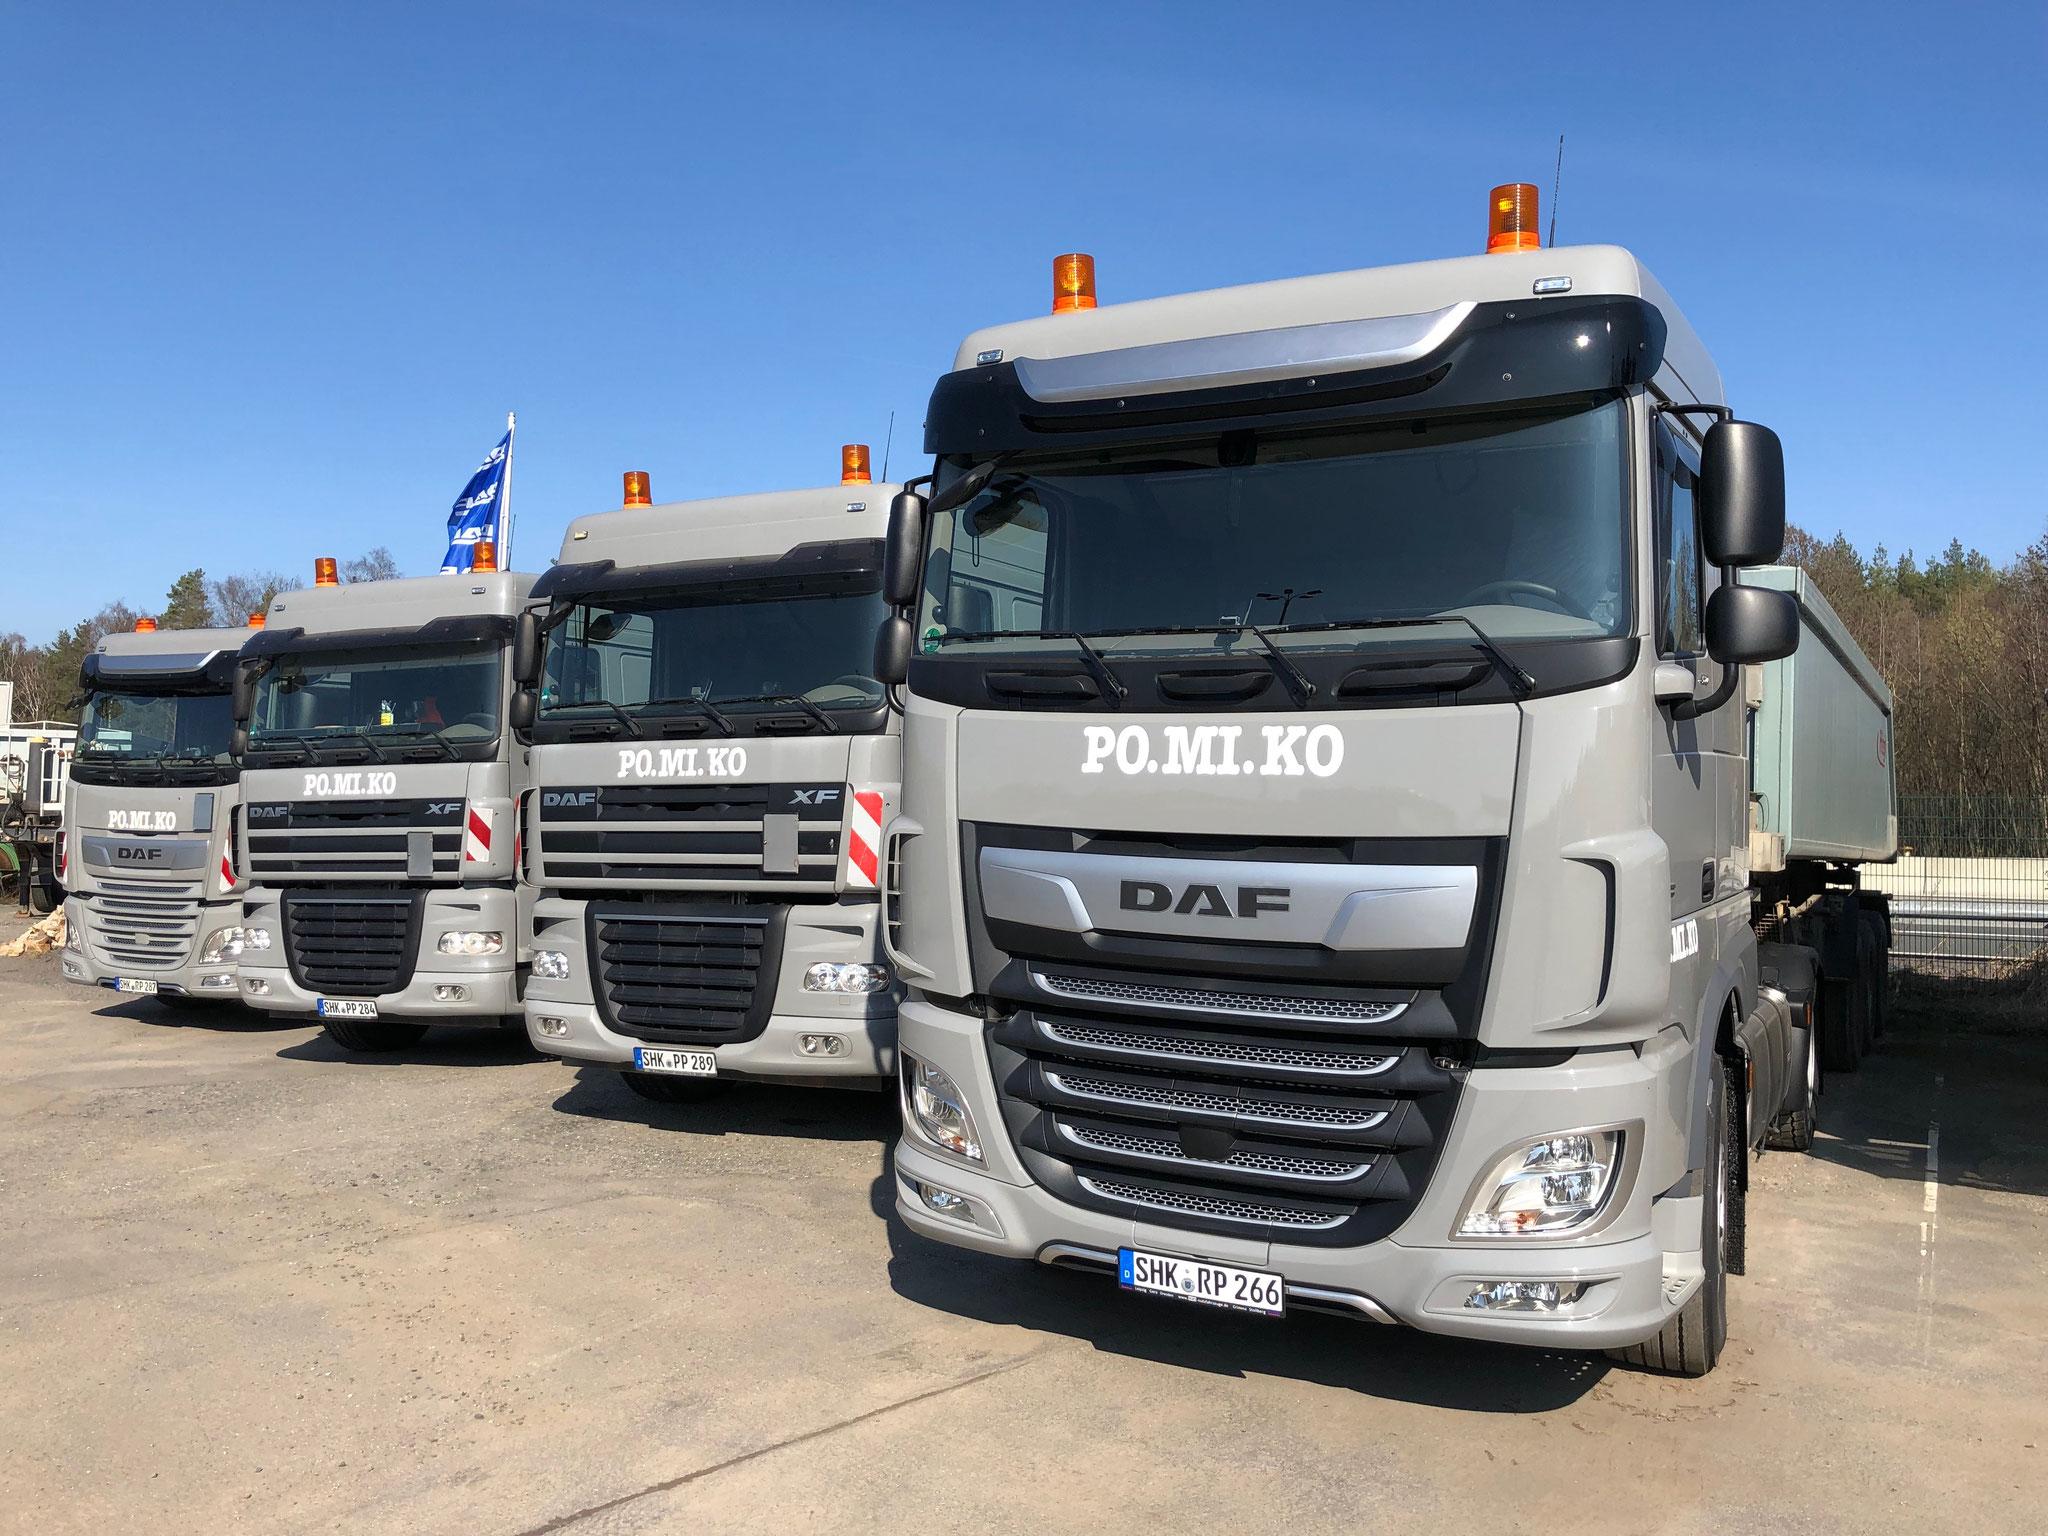 Komplettierung der Schüttgut-Sattel-Flotte durch Neuanschaffung einer weiteren Sattelzugmaschine abgeschlossen!